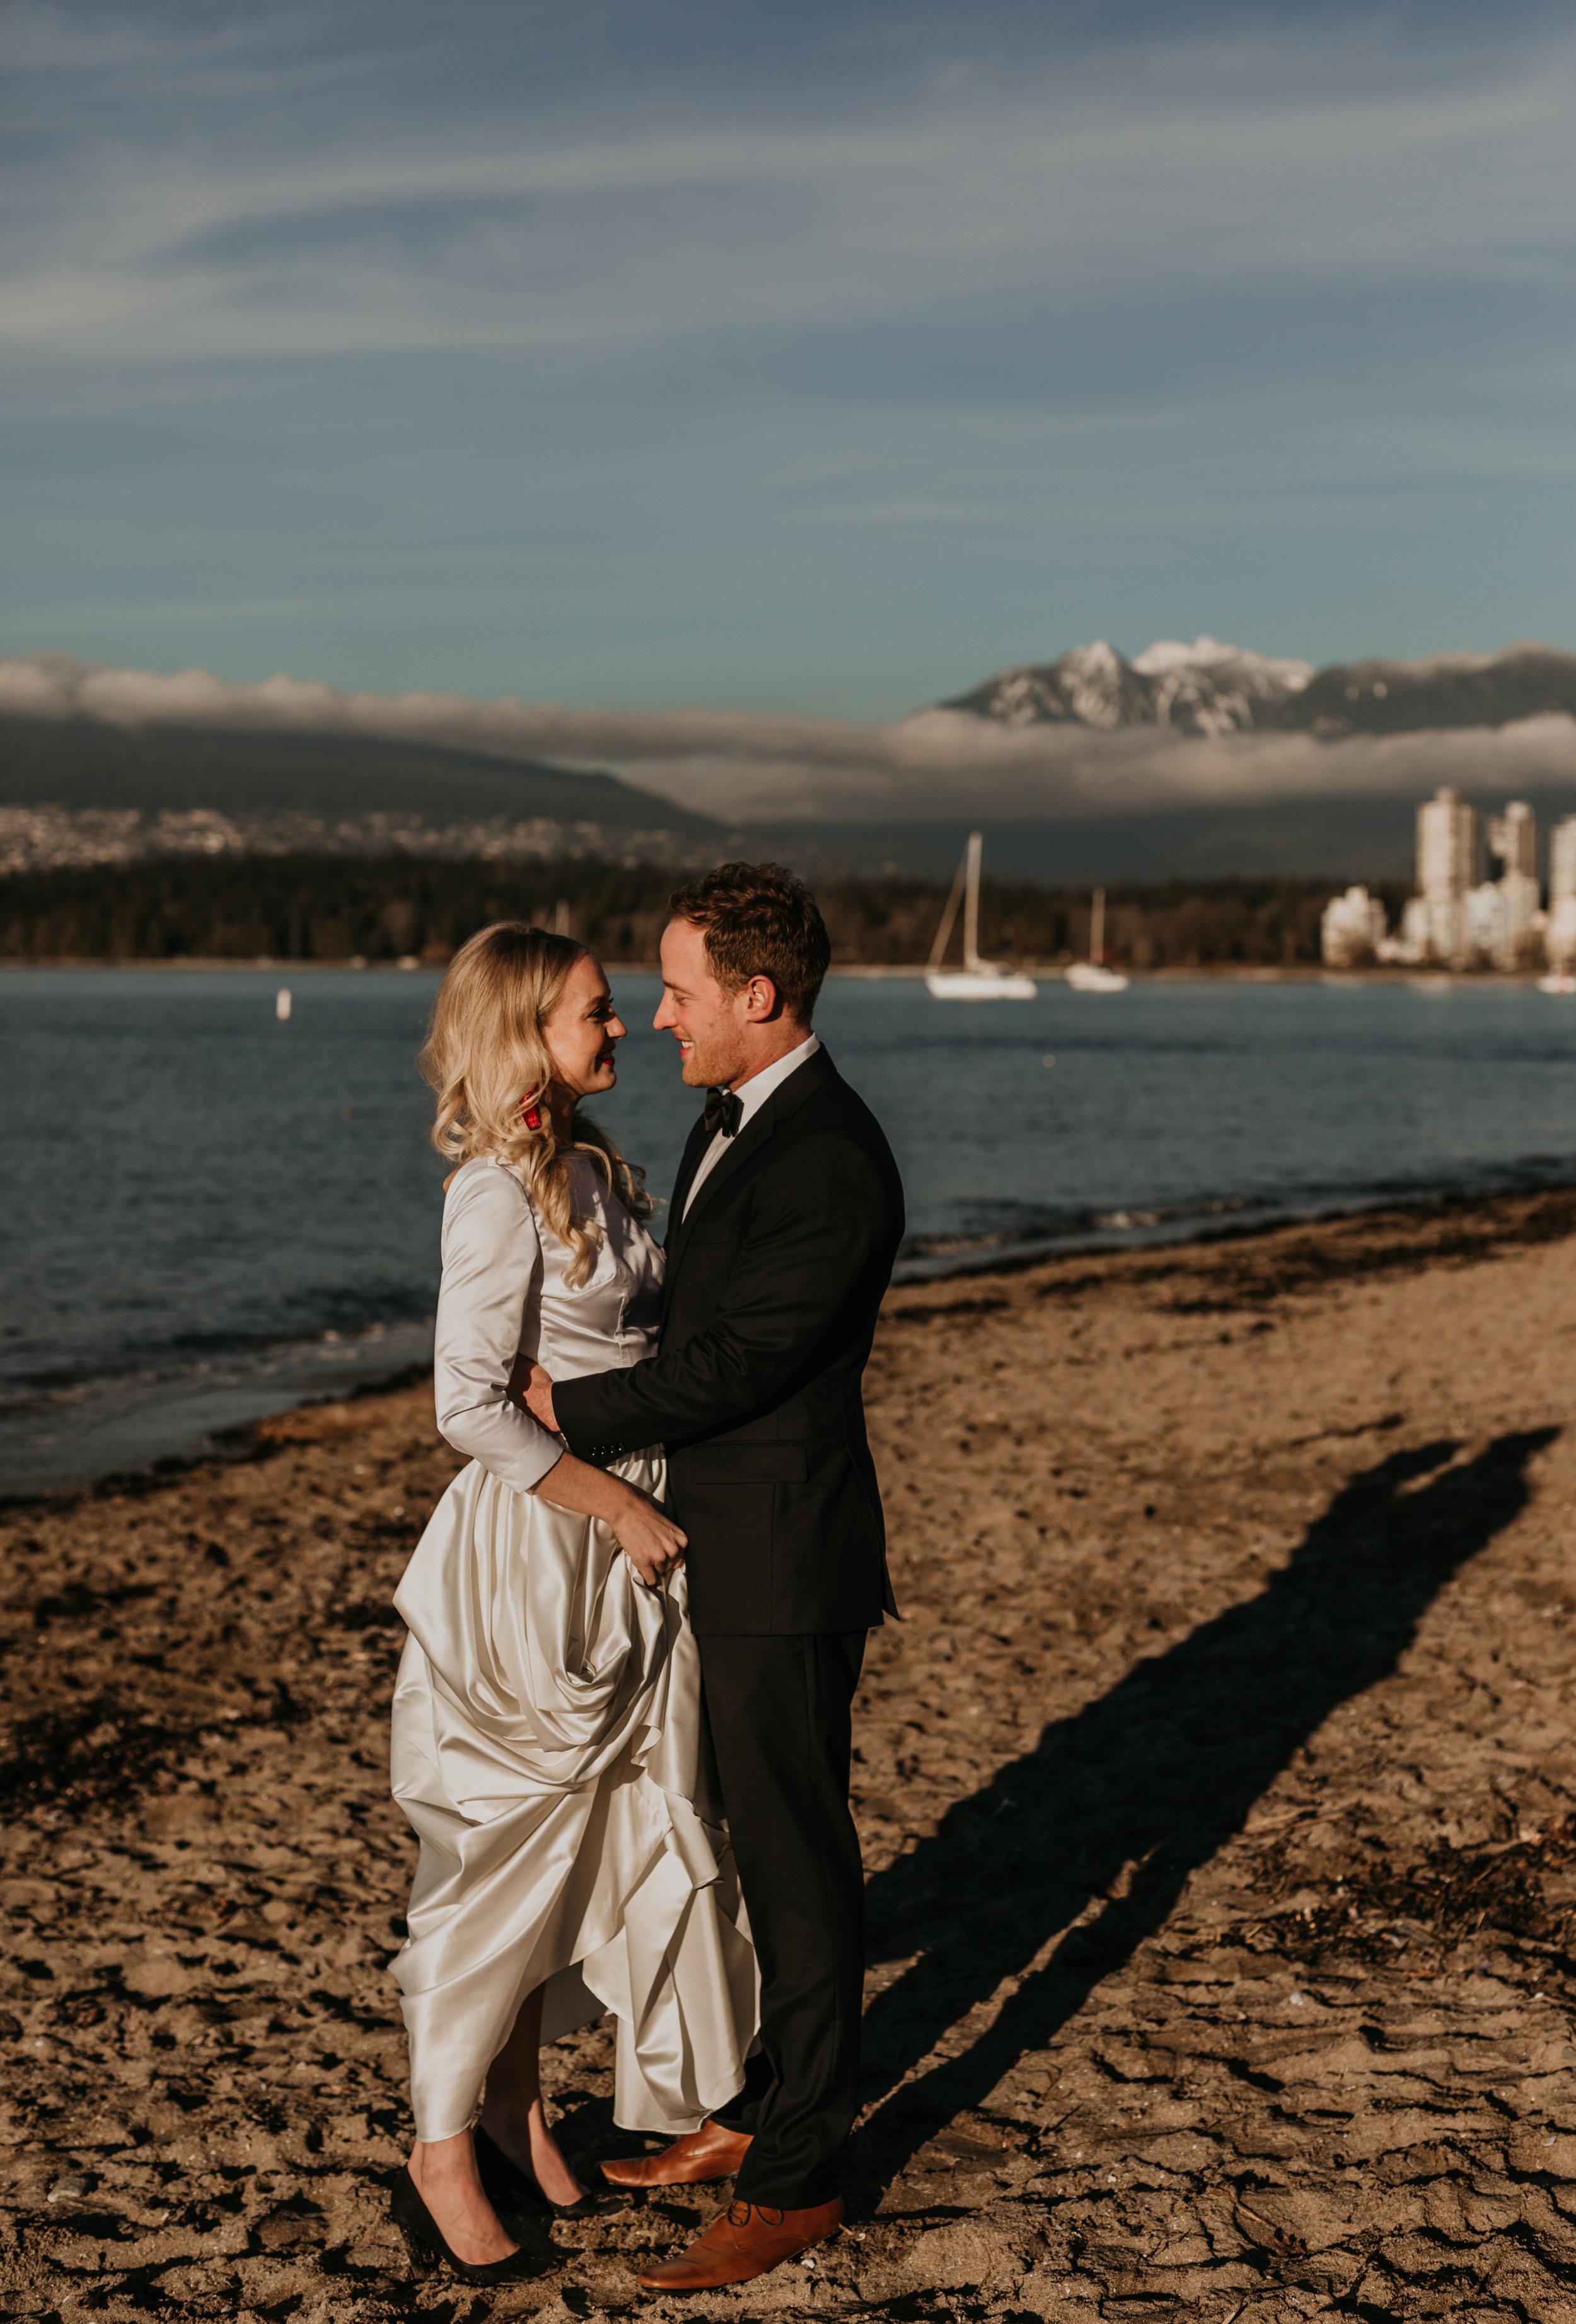 Vancouver Wedding Photos - Vegan Wedding Photographer - New Years Eve Wedding Photos - Vancouver Wedding Photographer - Vancouver Wedding Videographer - 603.JPG